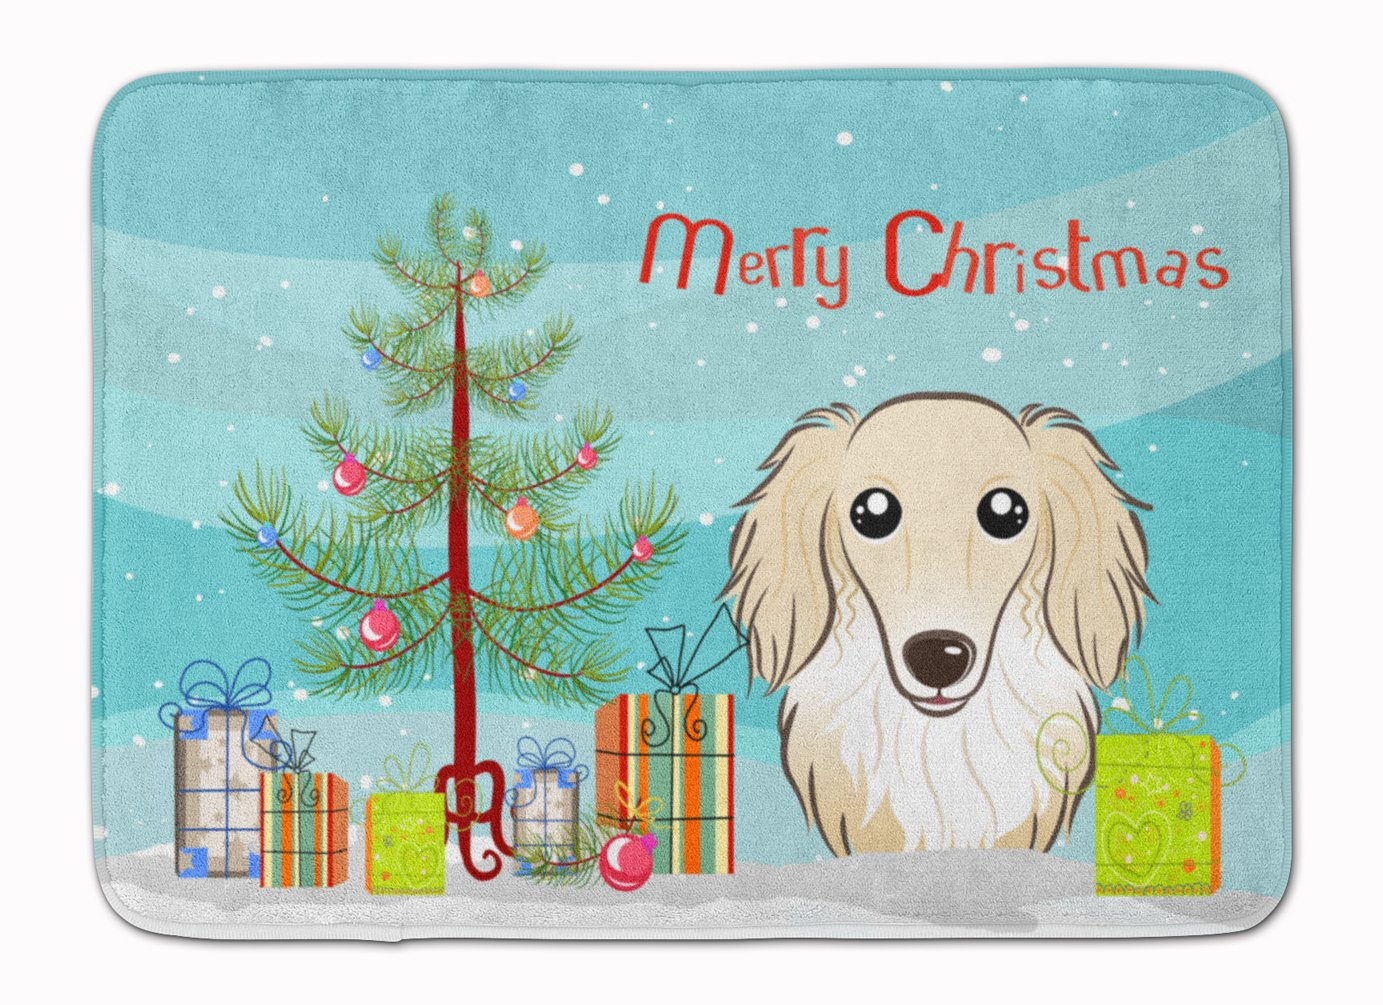 Carolines Treasures Christmas and Longhair Creme Dachshund Floor Mat 19 x 27 Multicolor